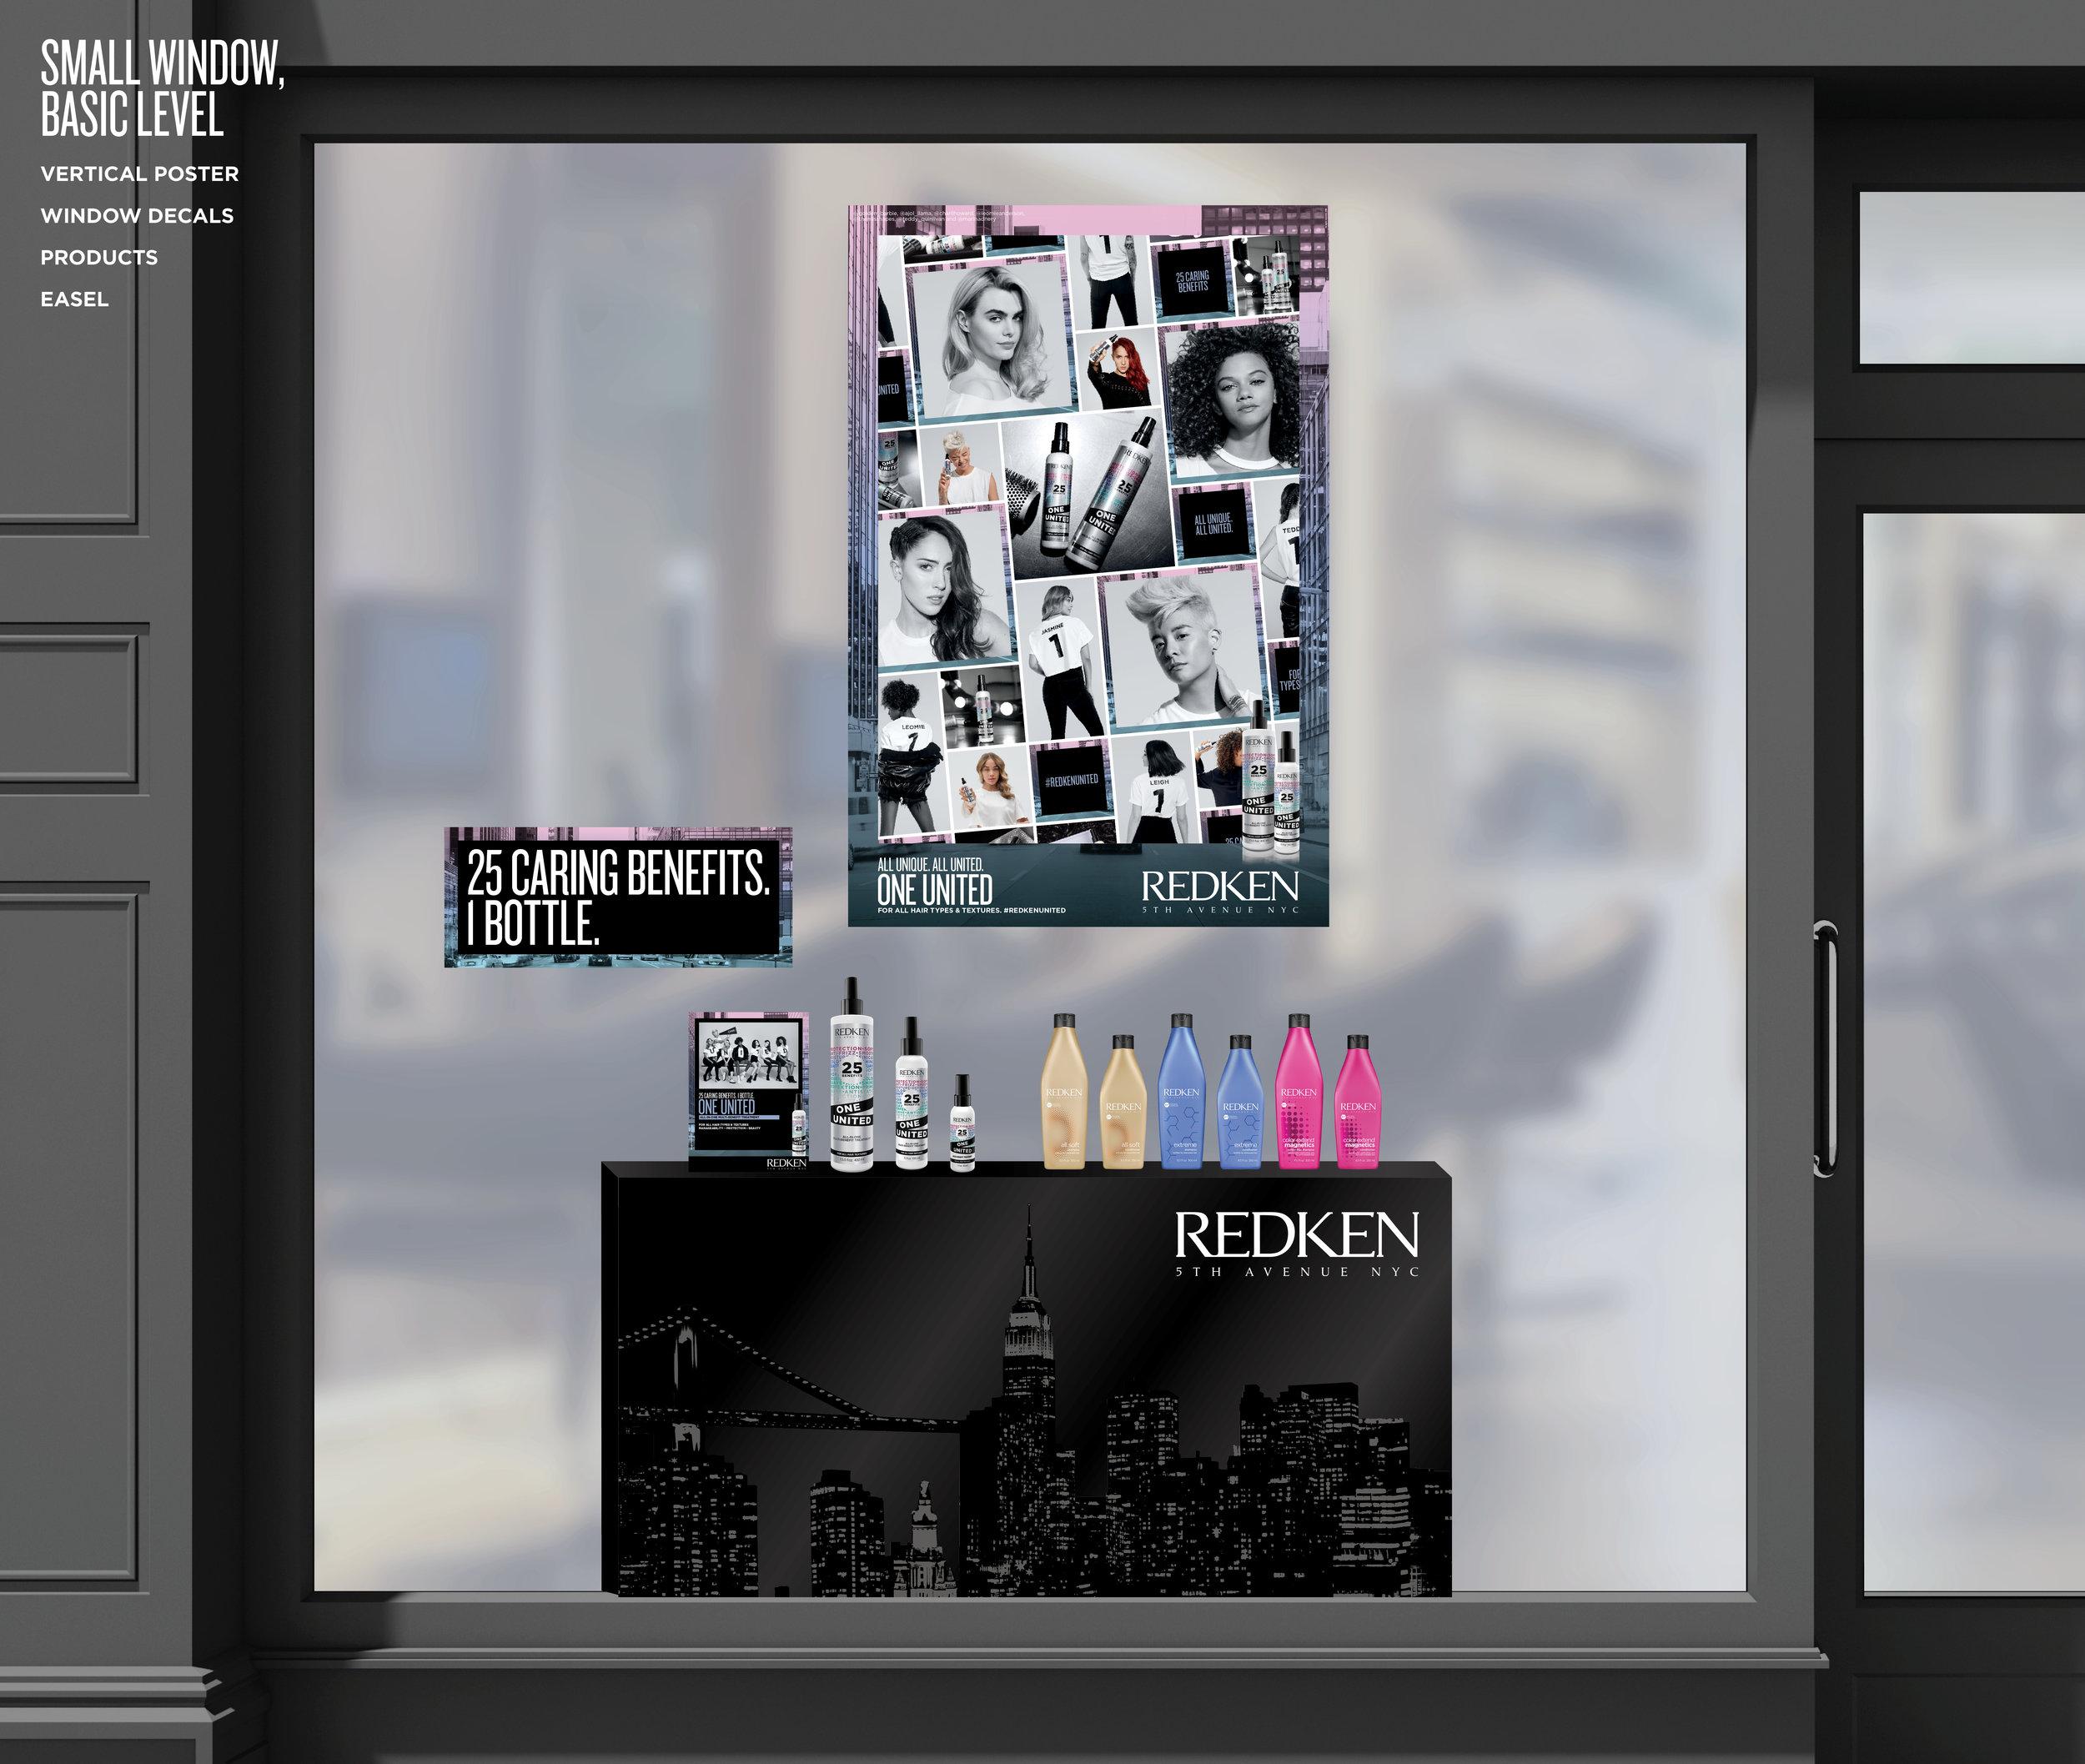 Redken-GL-2018-One-United-Standard-Window.jpg